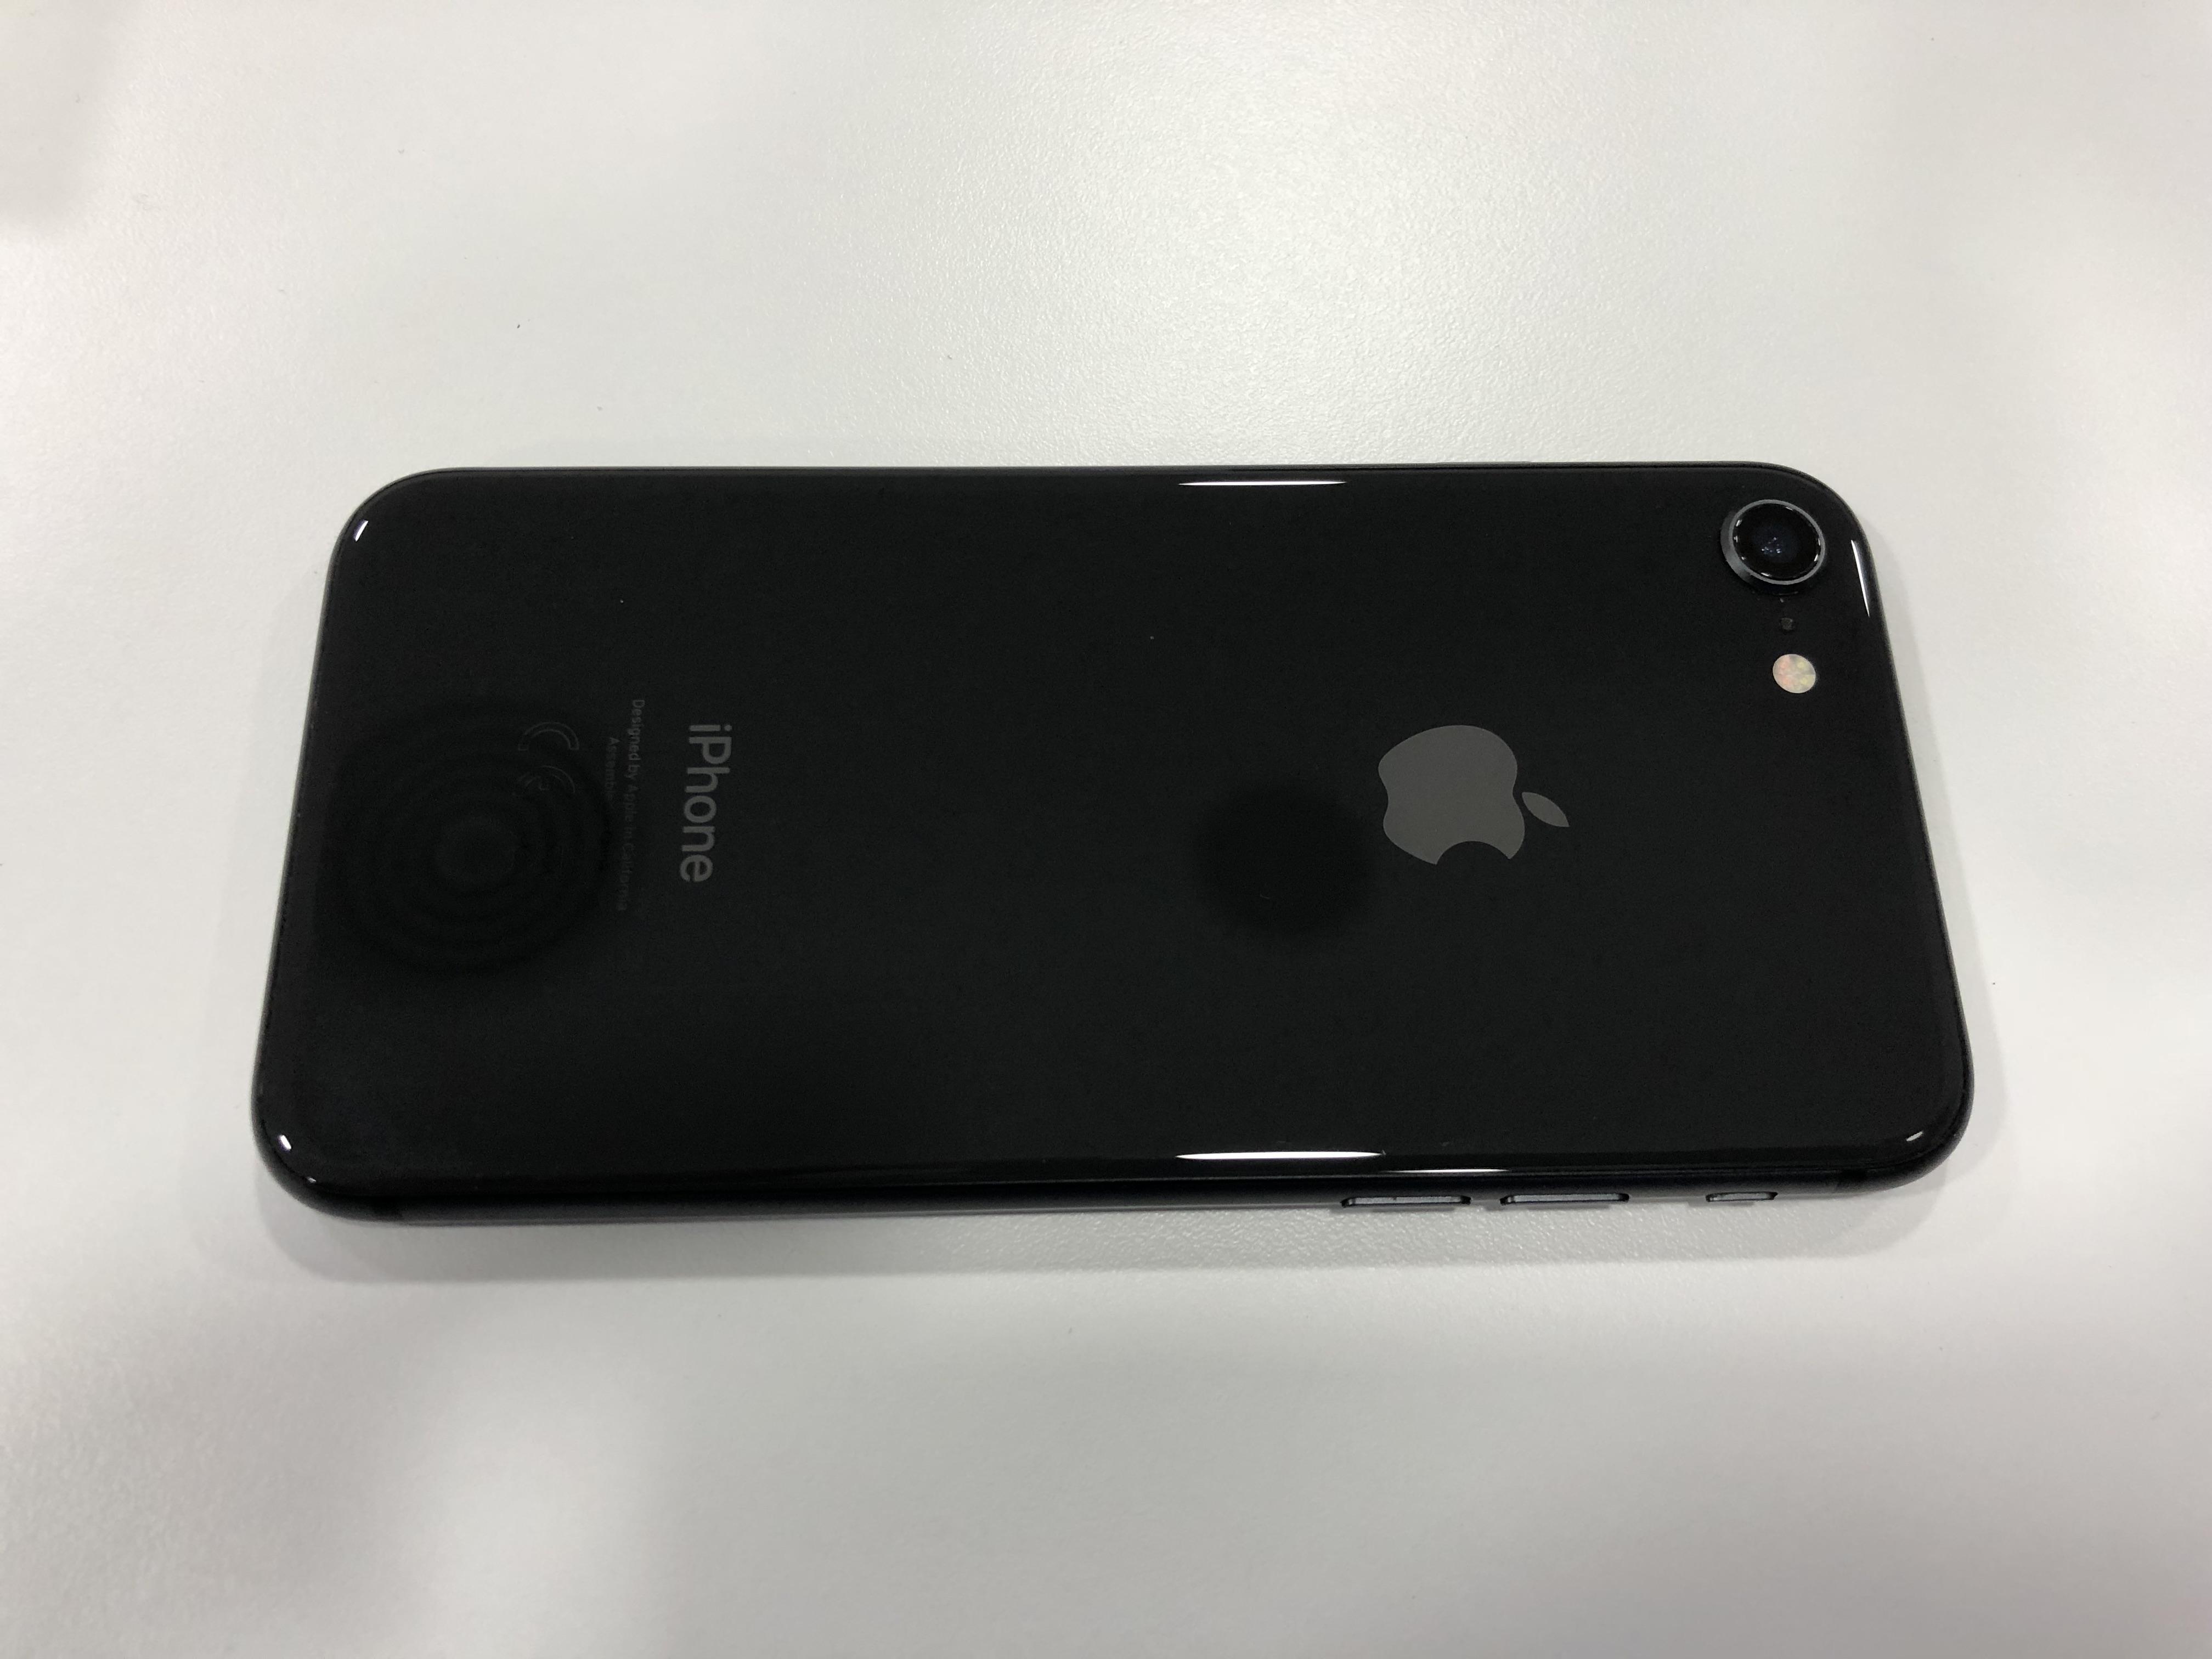 iPhone 8 64GB, 64 GB, SPACE GRAY, imagen 2